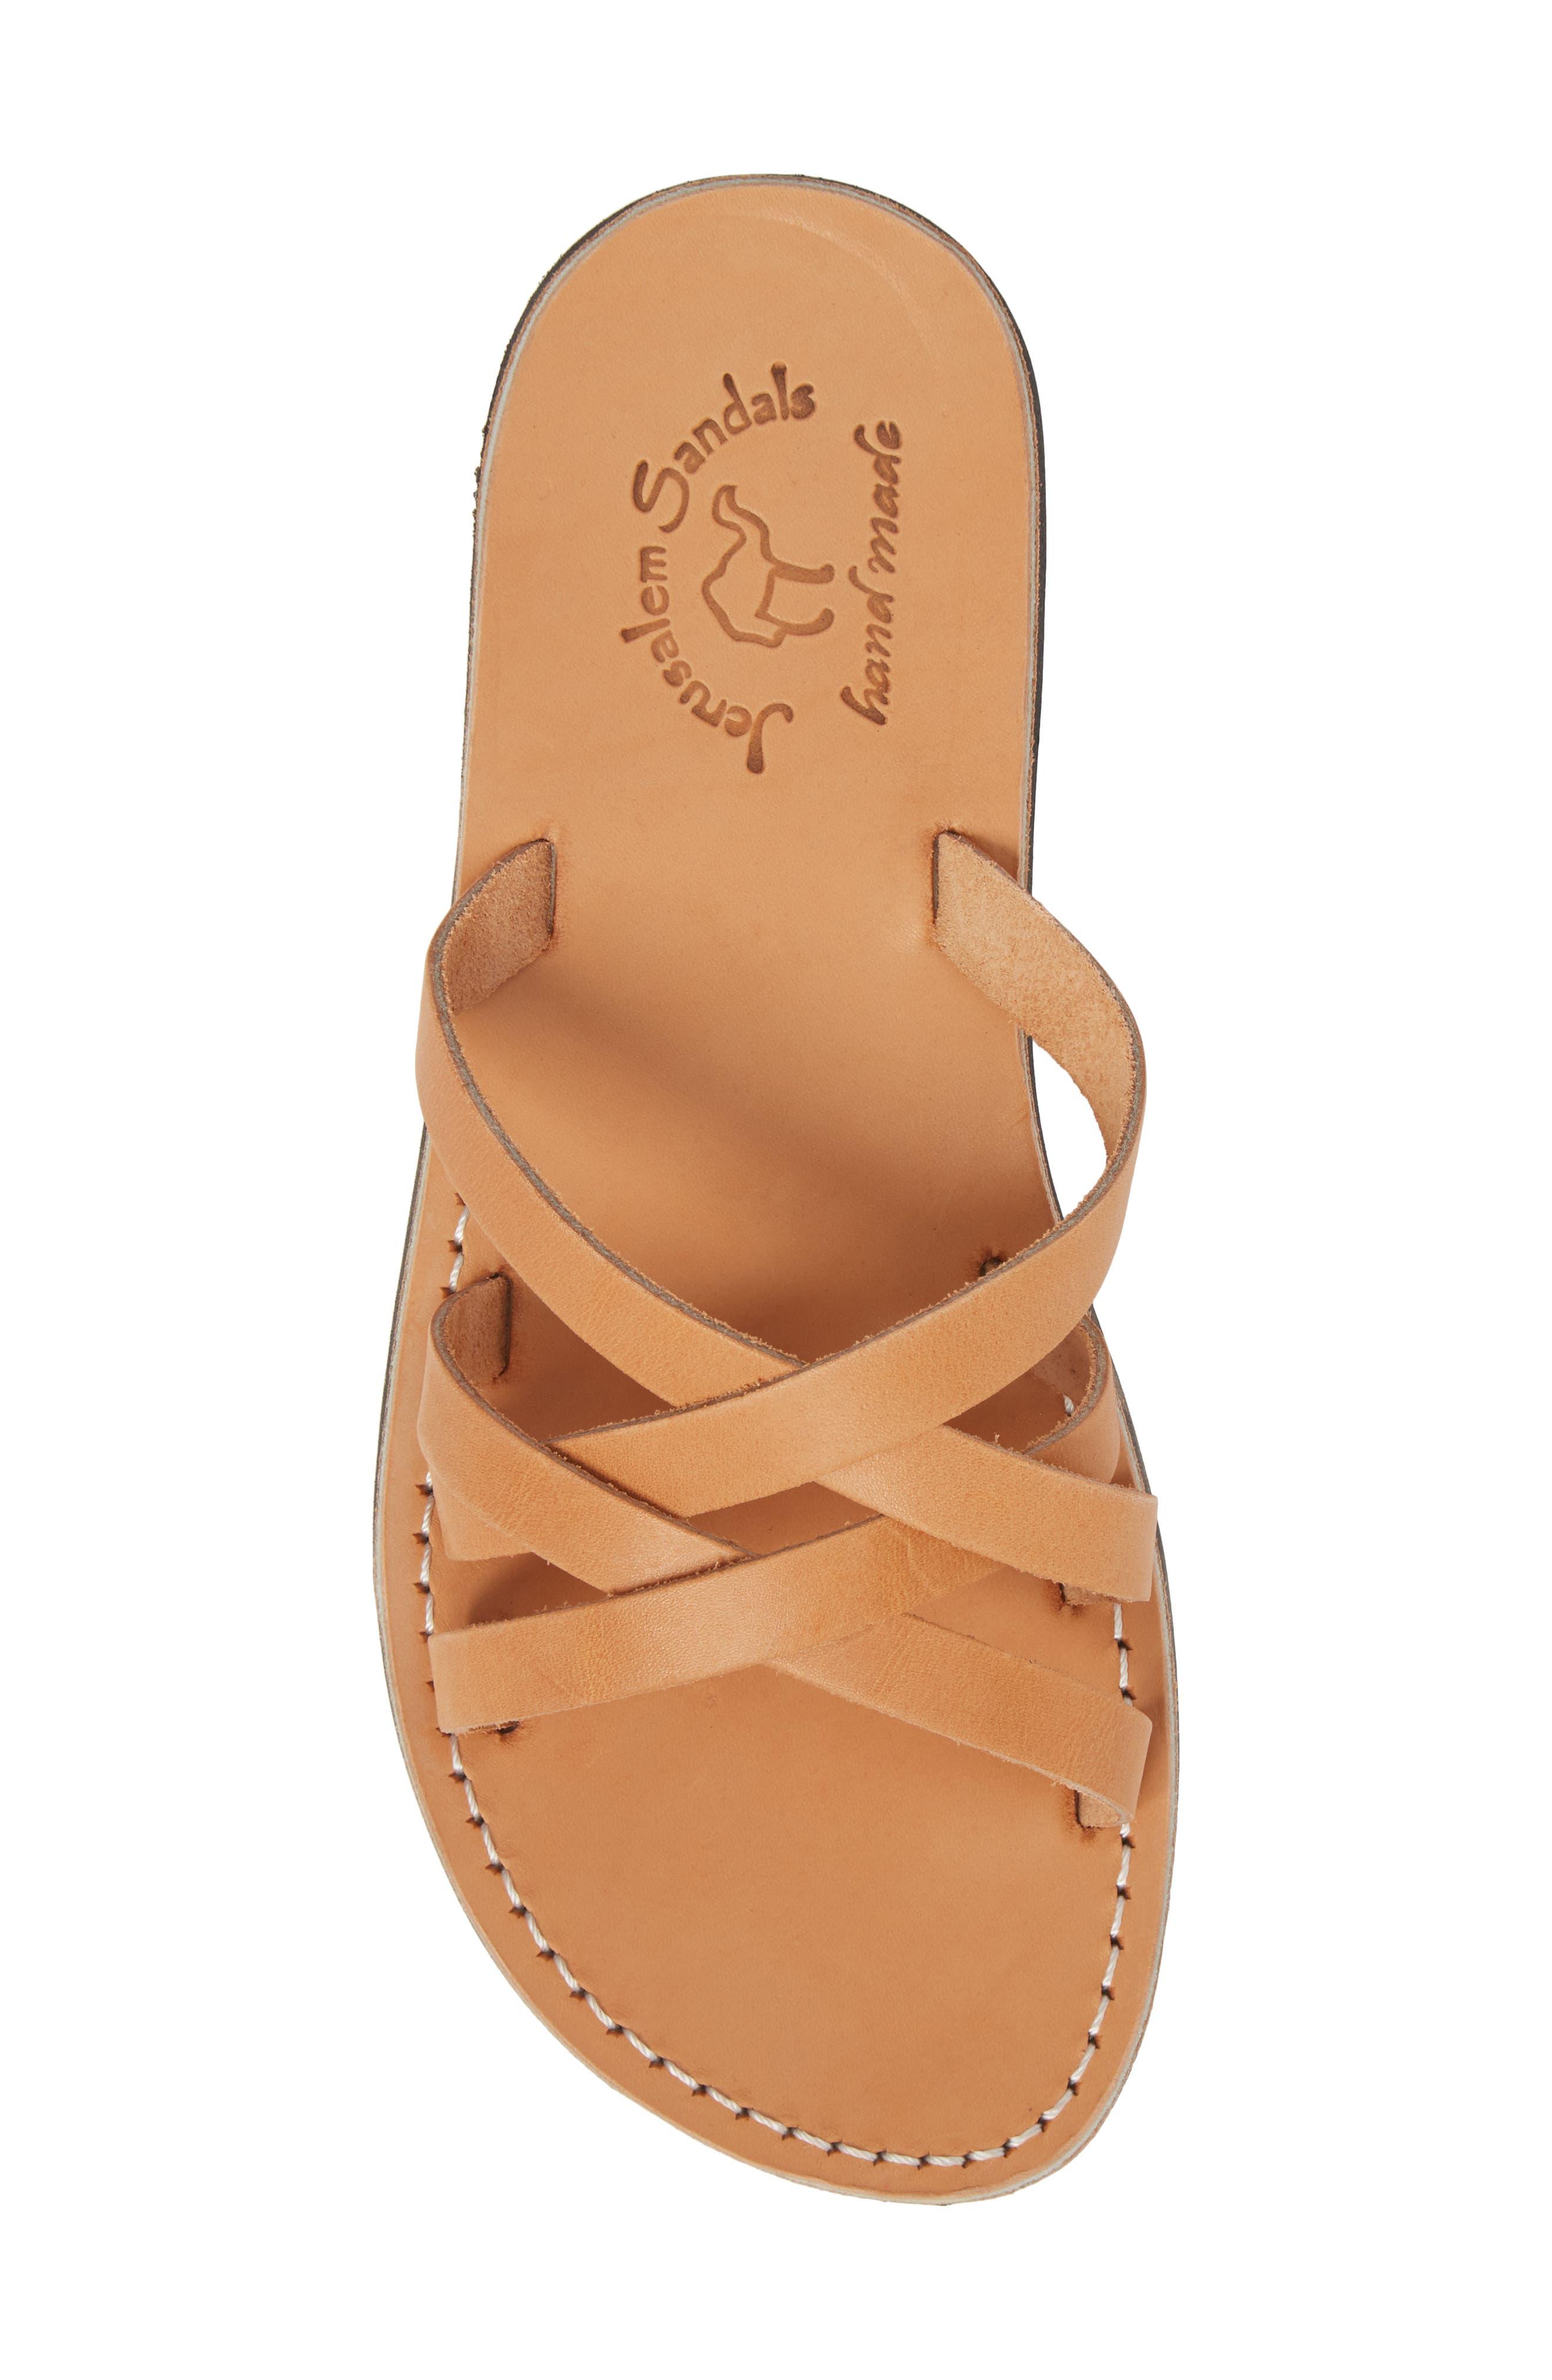 Gad Cross Strap Slide Sandal,                             Alternate thumbnail 5, color,                             Tan Leather